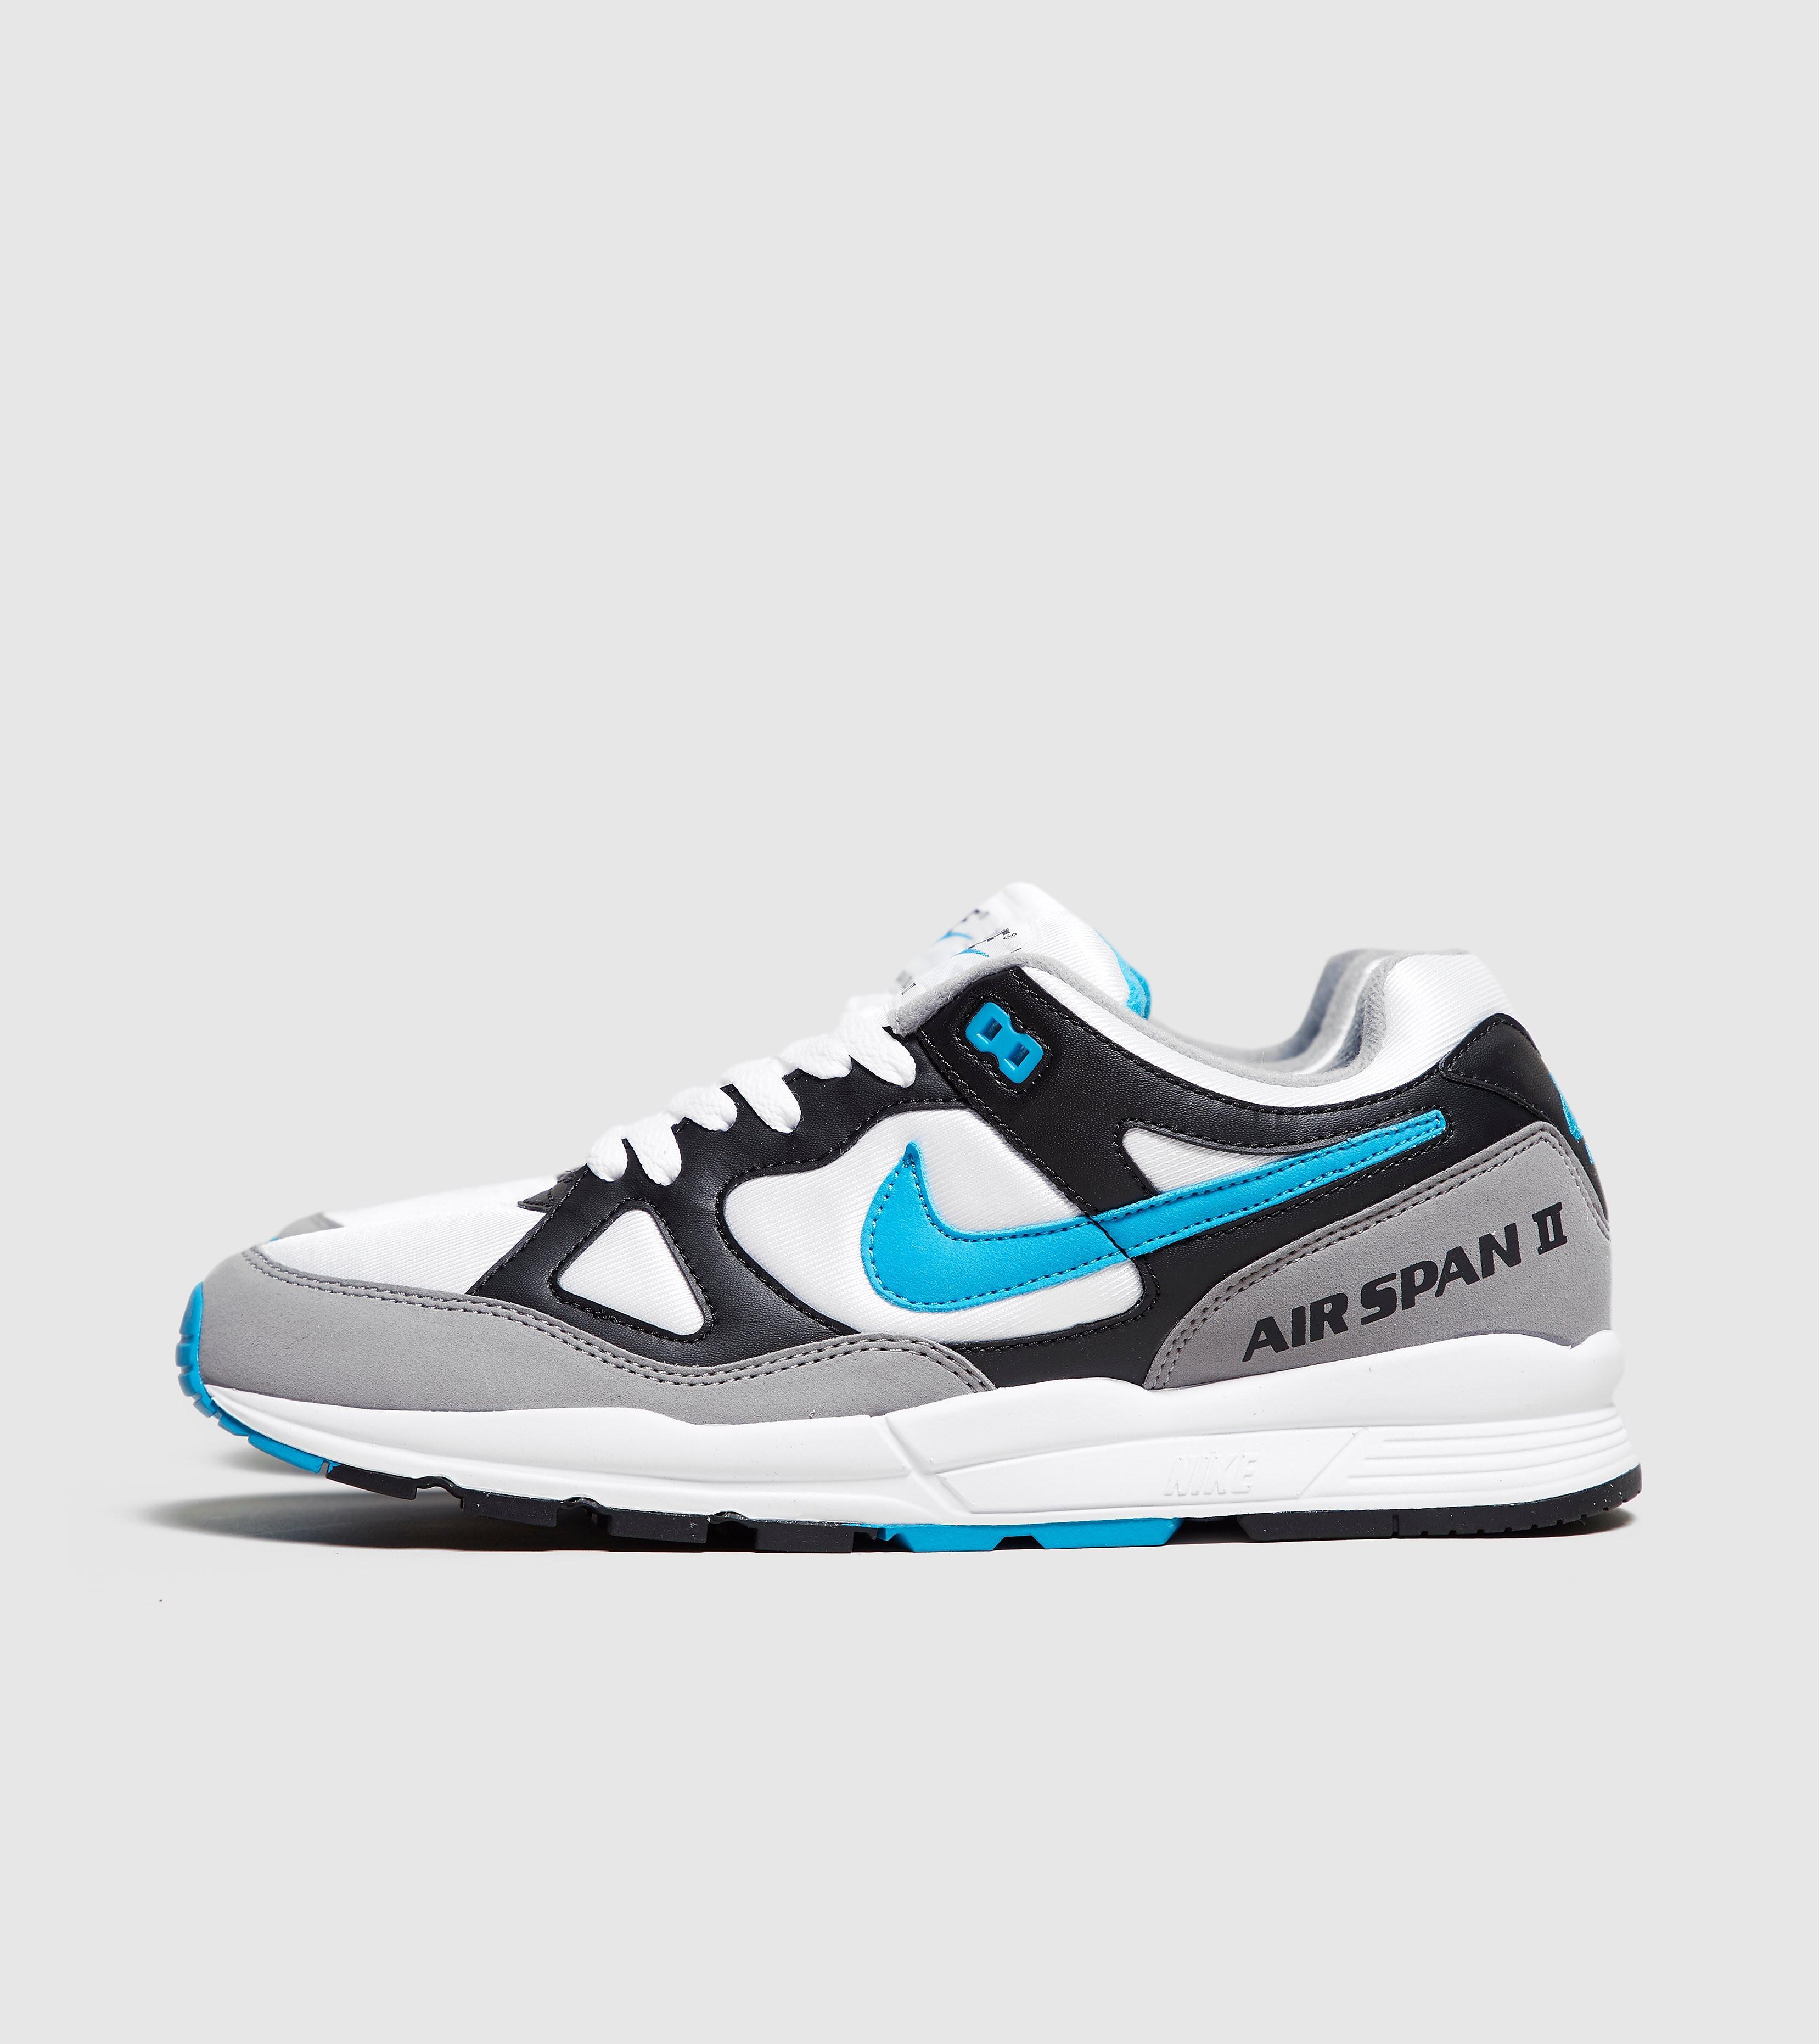 Nike Air Span